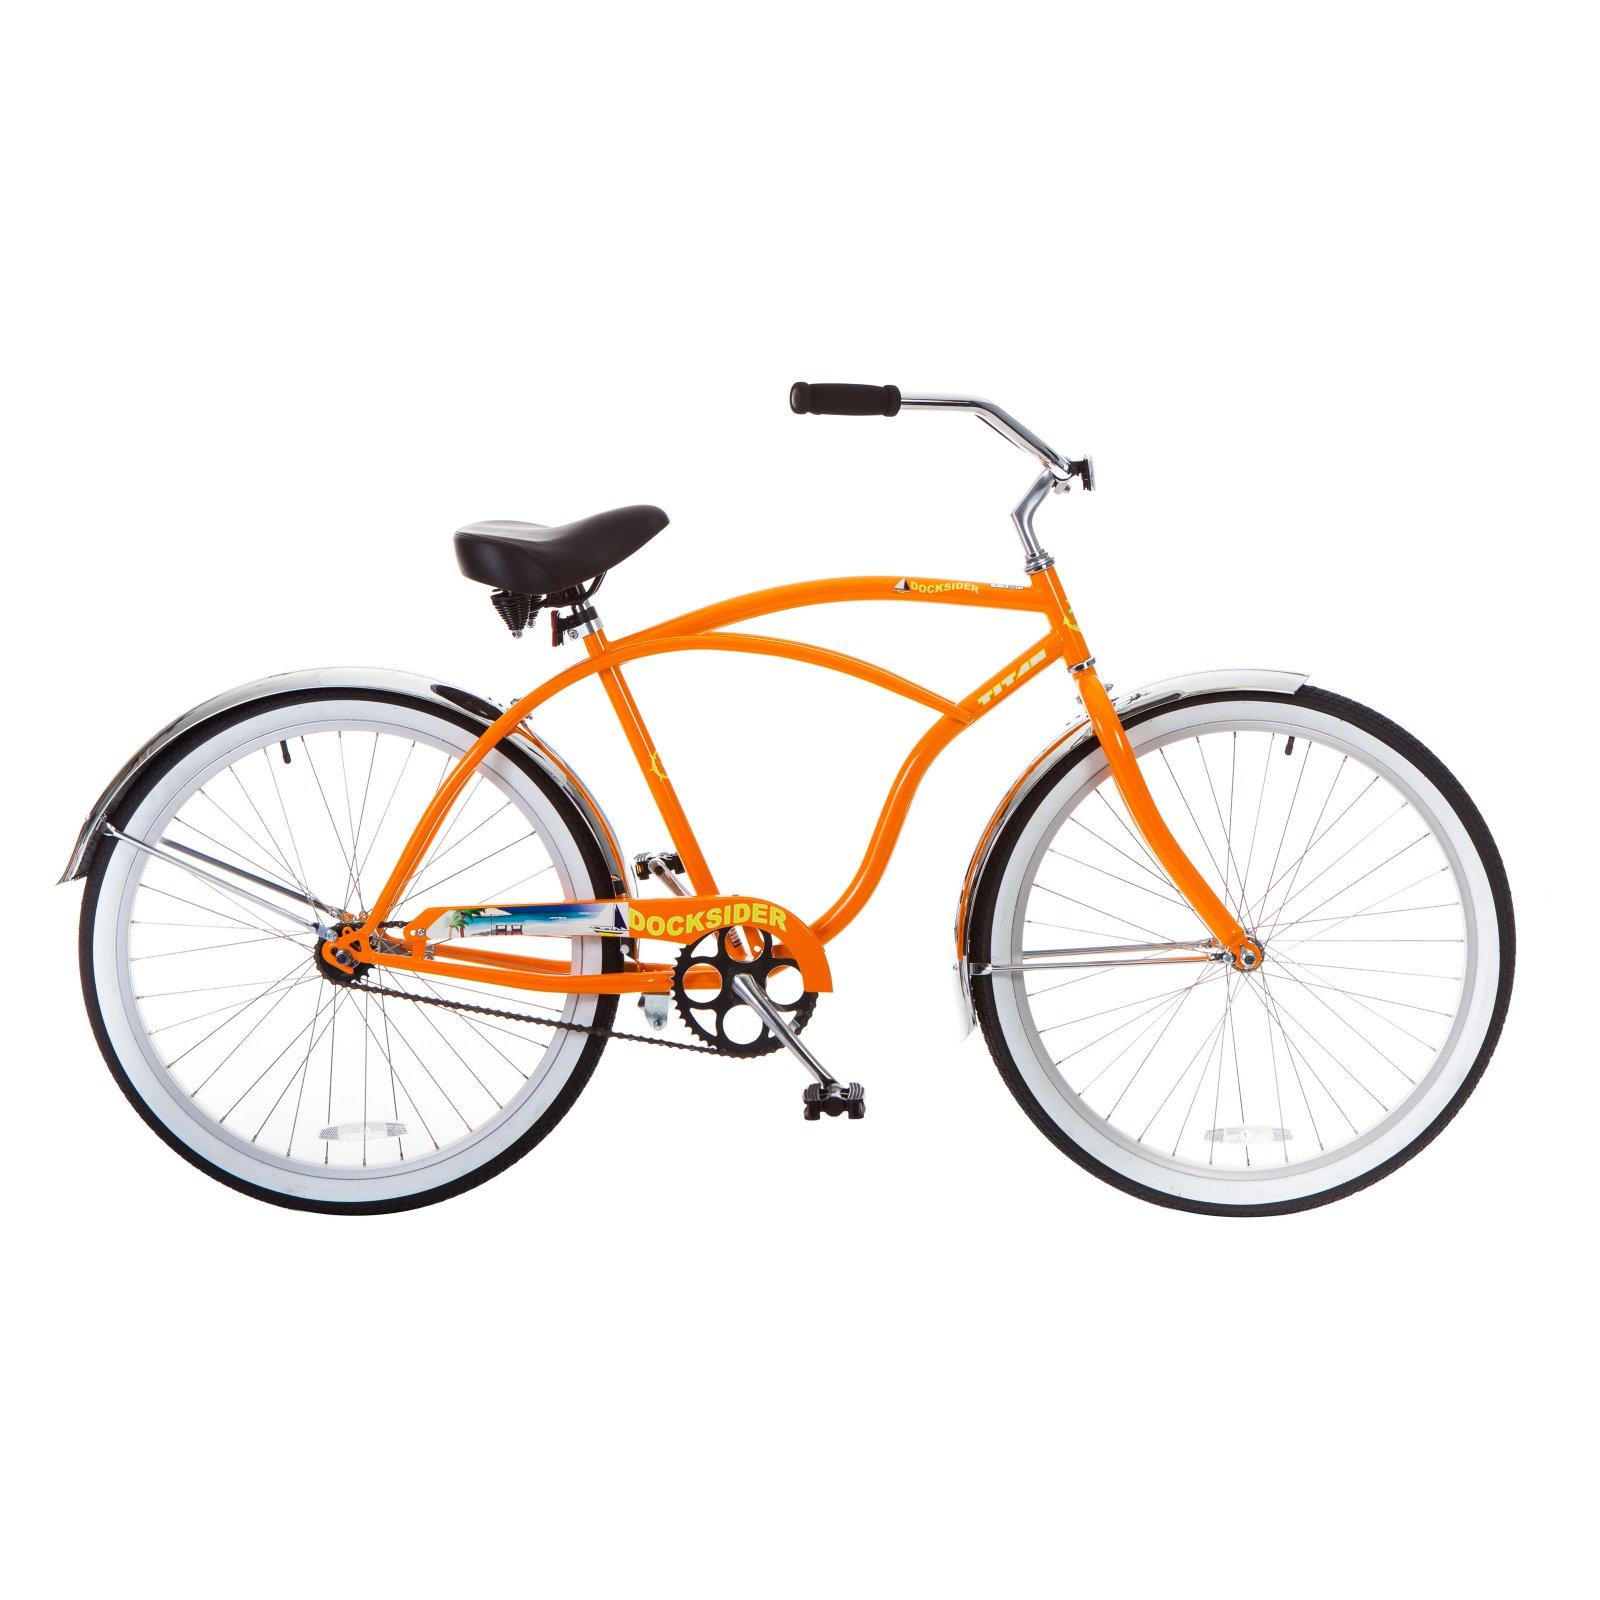 "TITAN Docksider Mens Beach Cruiser Single-Speed Bicycle, 18"" Frame, 26"" Wheels, Tangerine"